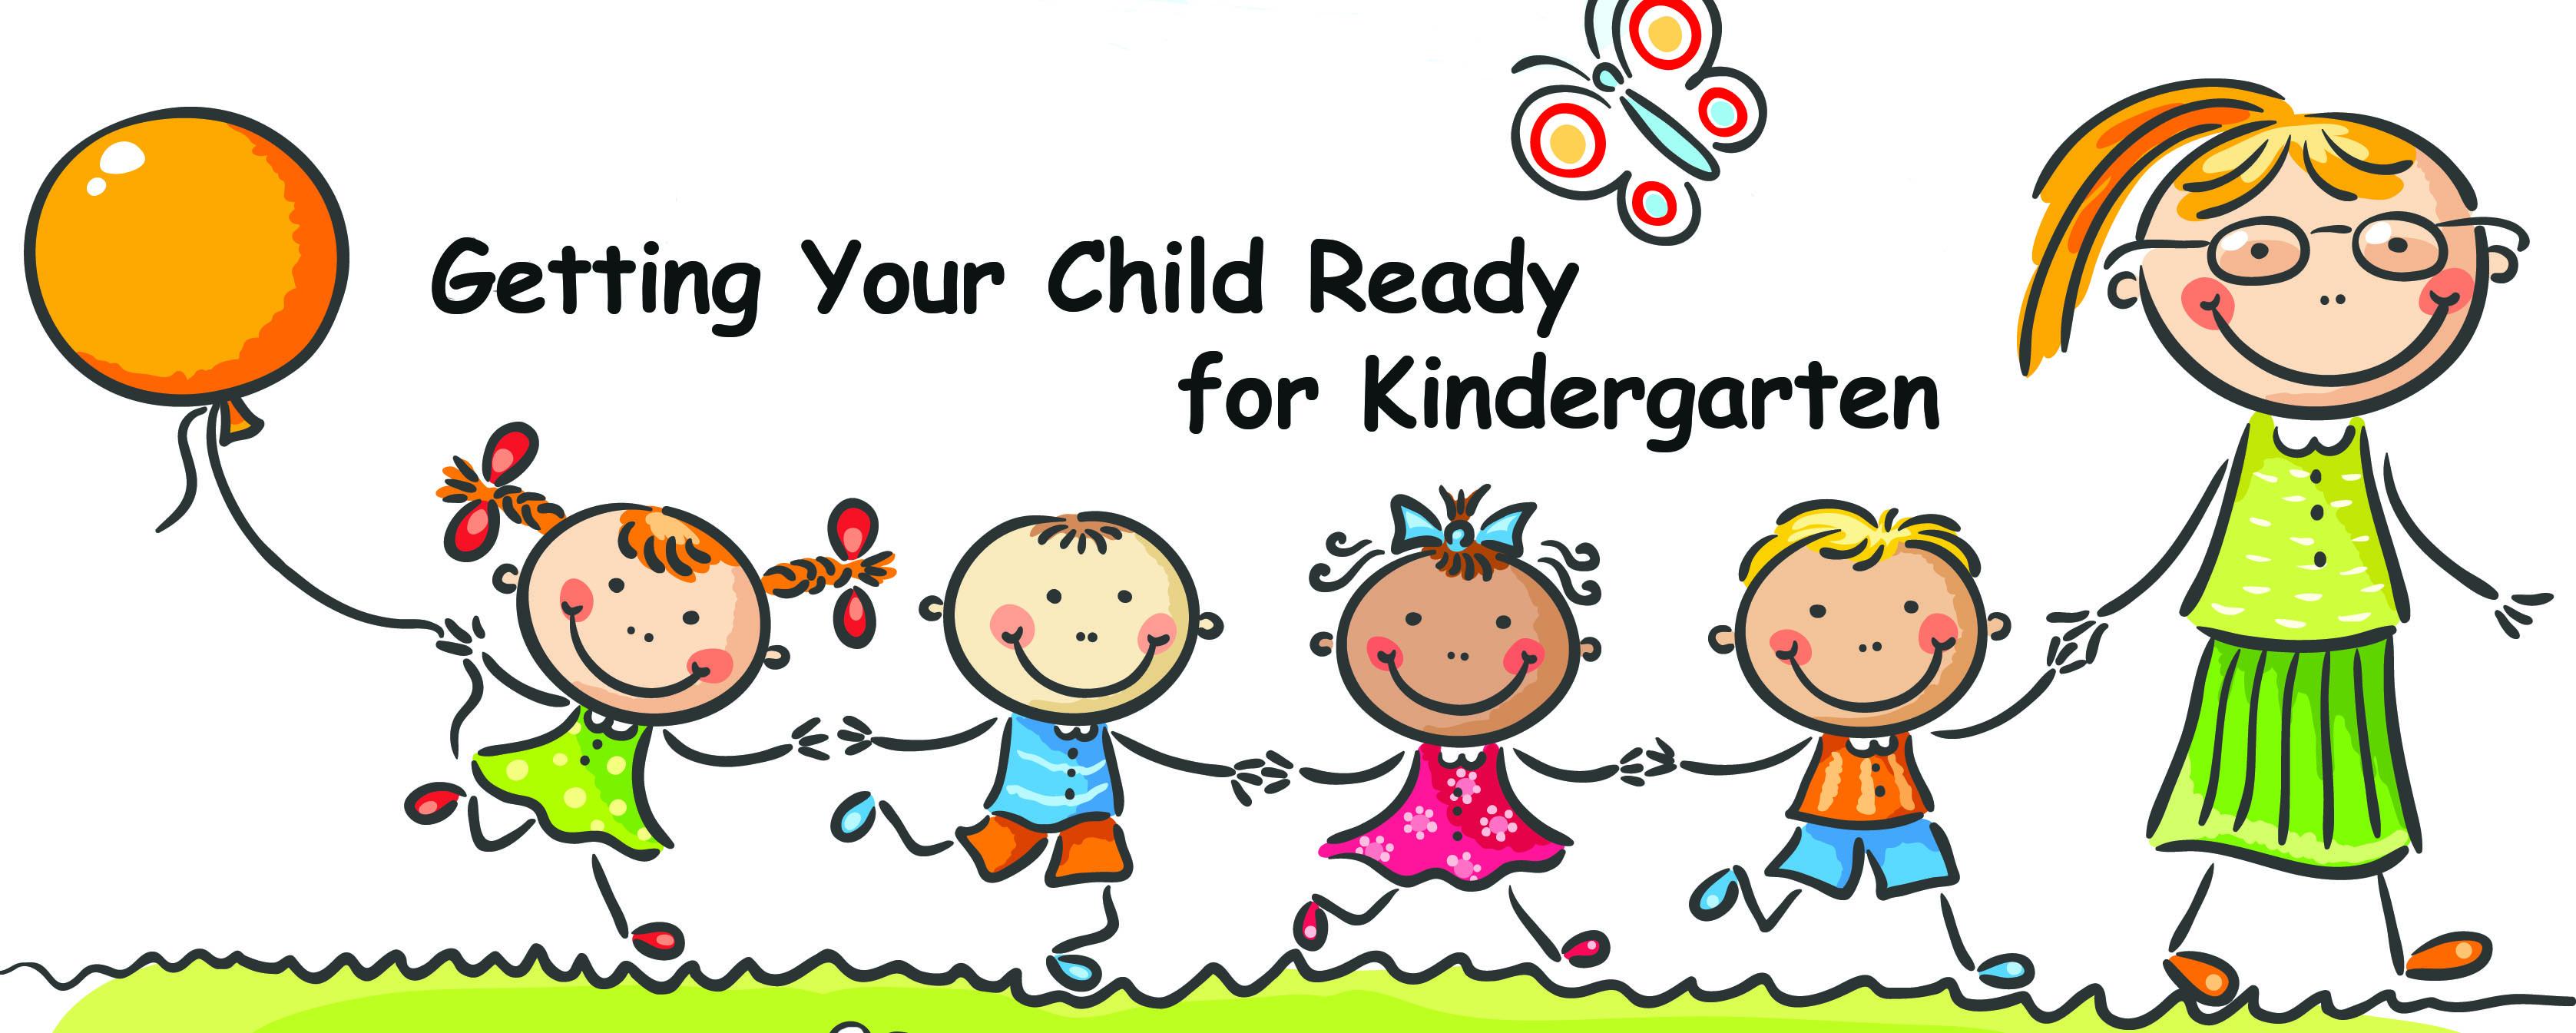 KindergartenReady - Is My Child Ready For Kindergarten